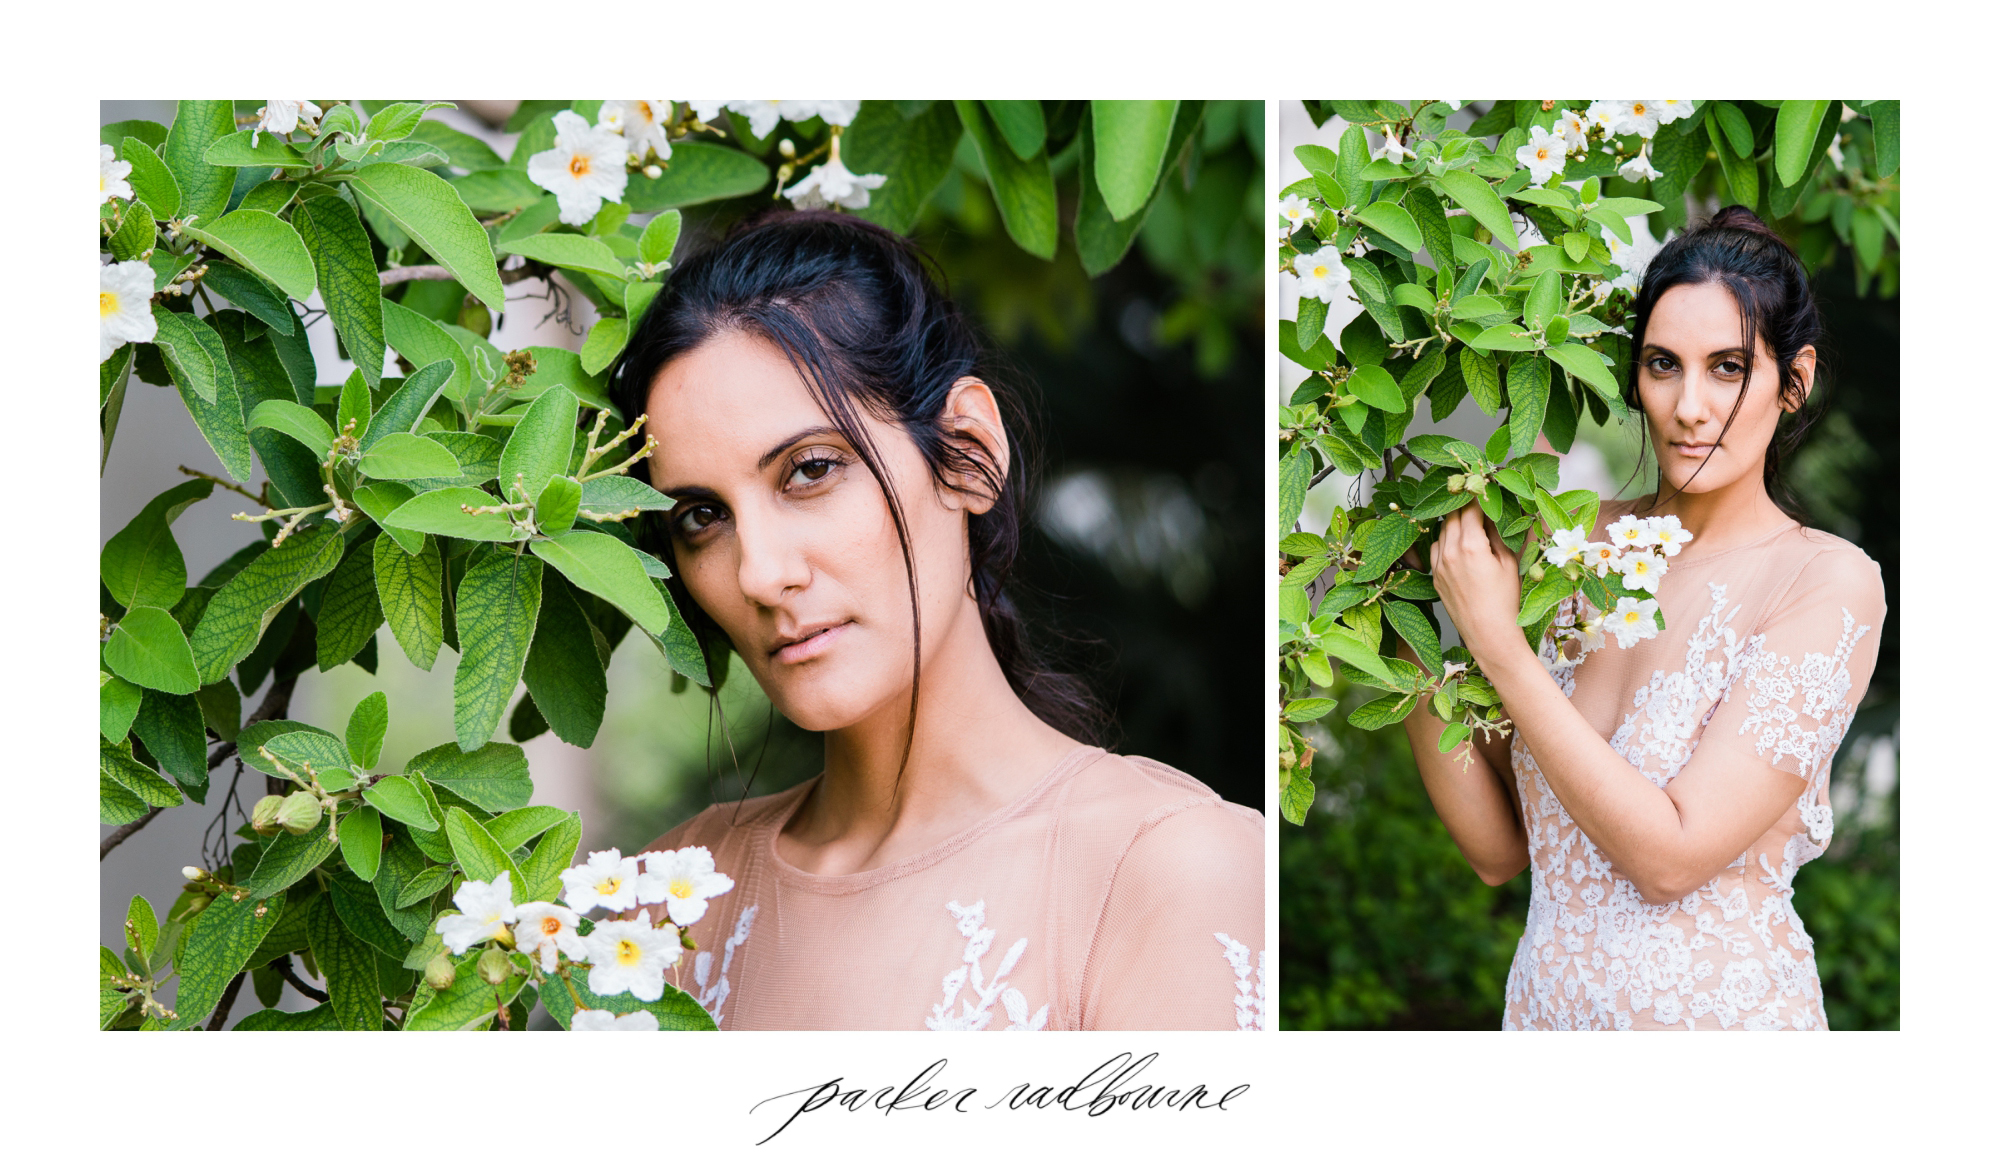 Model: Dani Rodriguez Photographer: Parker Radbourne of The PK Photographs Location:  San Antonio Botanical Gardens